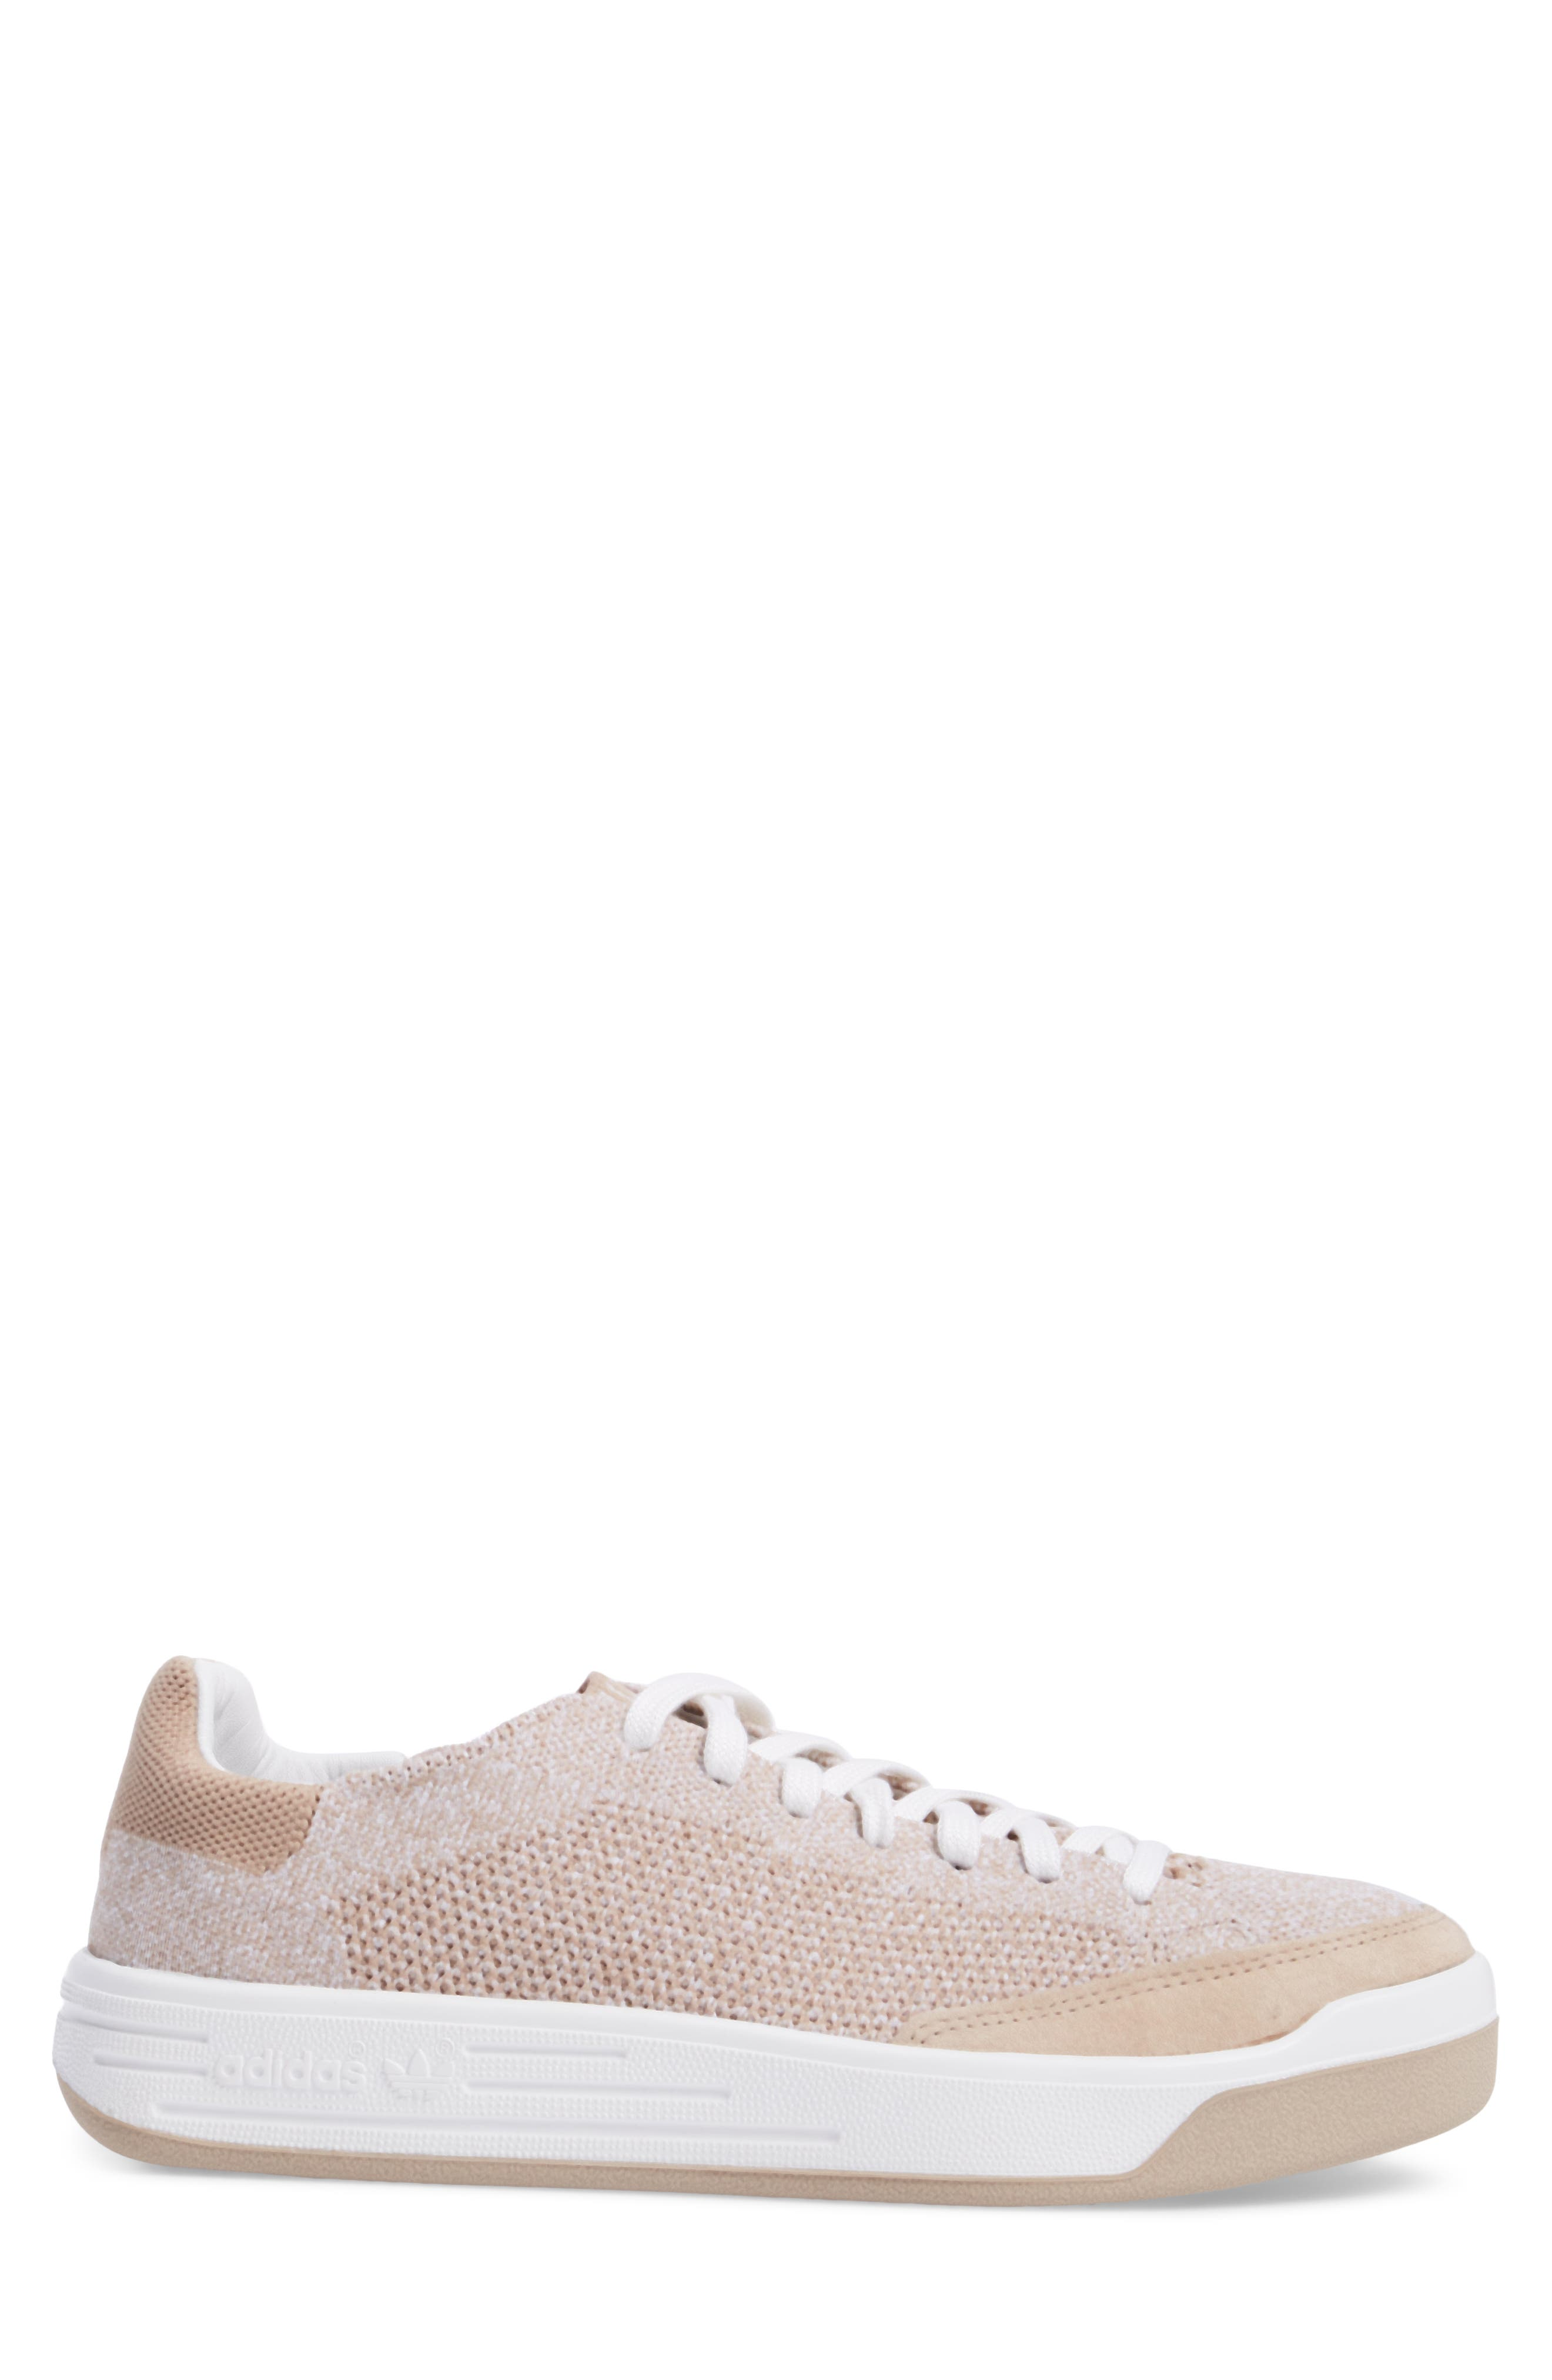 Rod Laver Super Primeknit Sneaker,                             Alternate thumbnail 6, color,